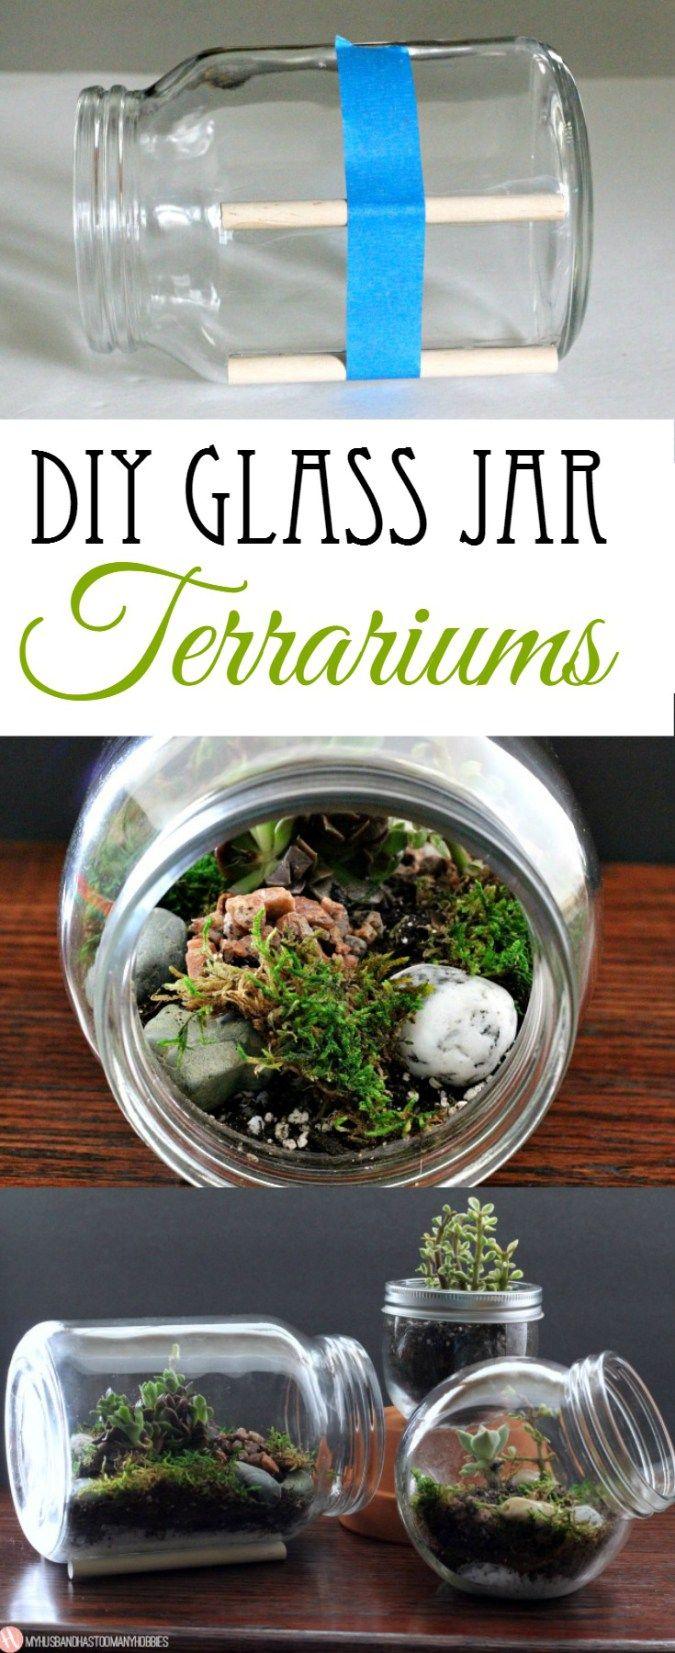 How To Diy Glass Jar Terrariums Pinterest Terraria Jar And Glass